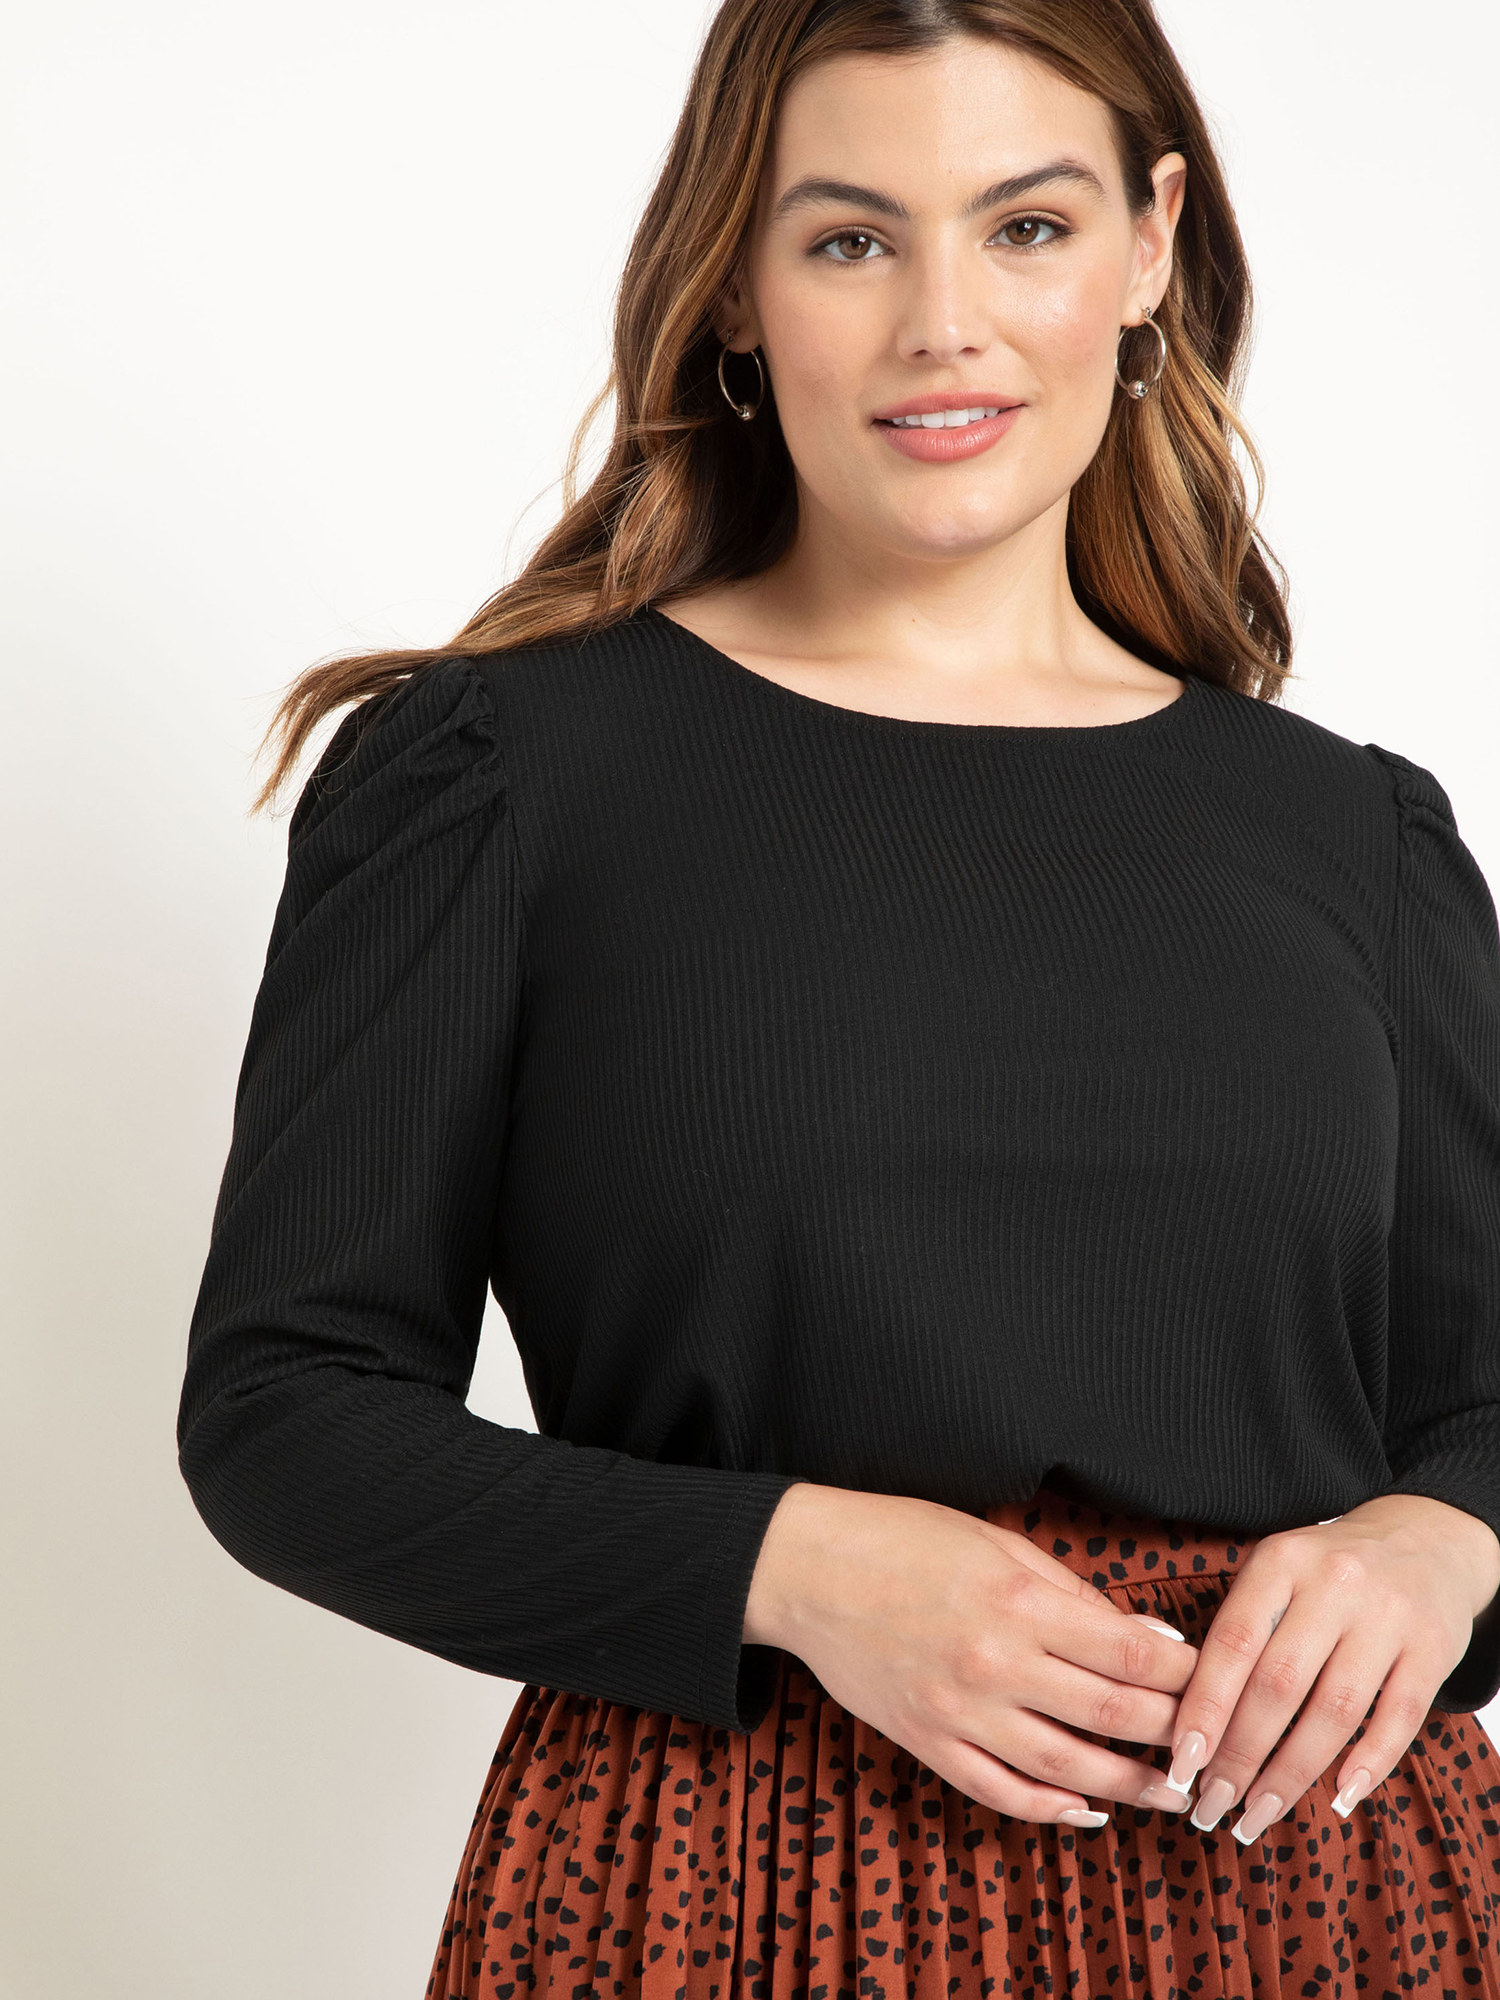 A model wearing the black shirt